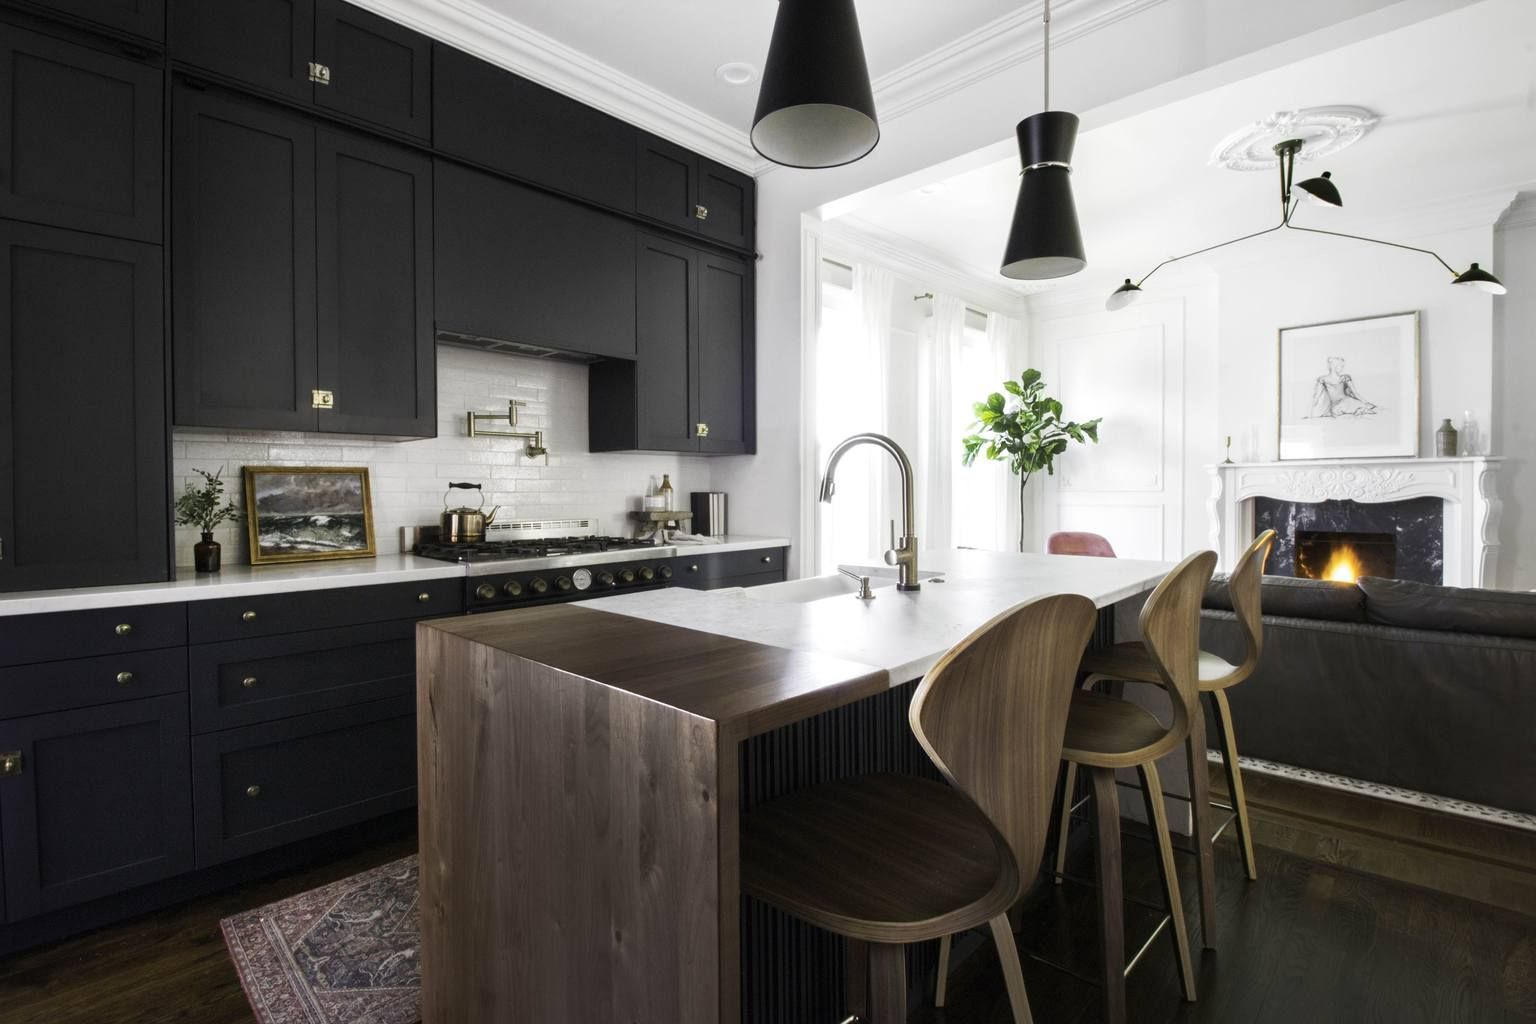 Brass Accents And Ebony Doors Make For A Darkly Dramatic Kitchen Kitchen Renovation Victorian Kitchen Kitchen Cabinets Decor